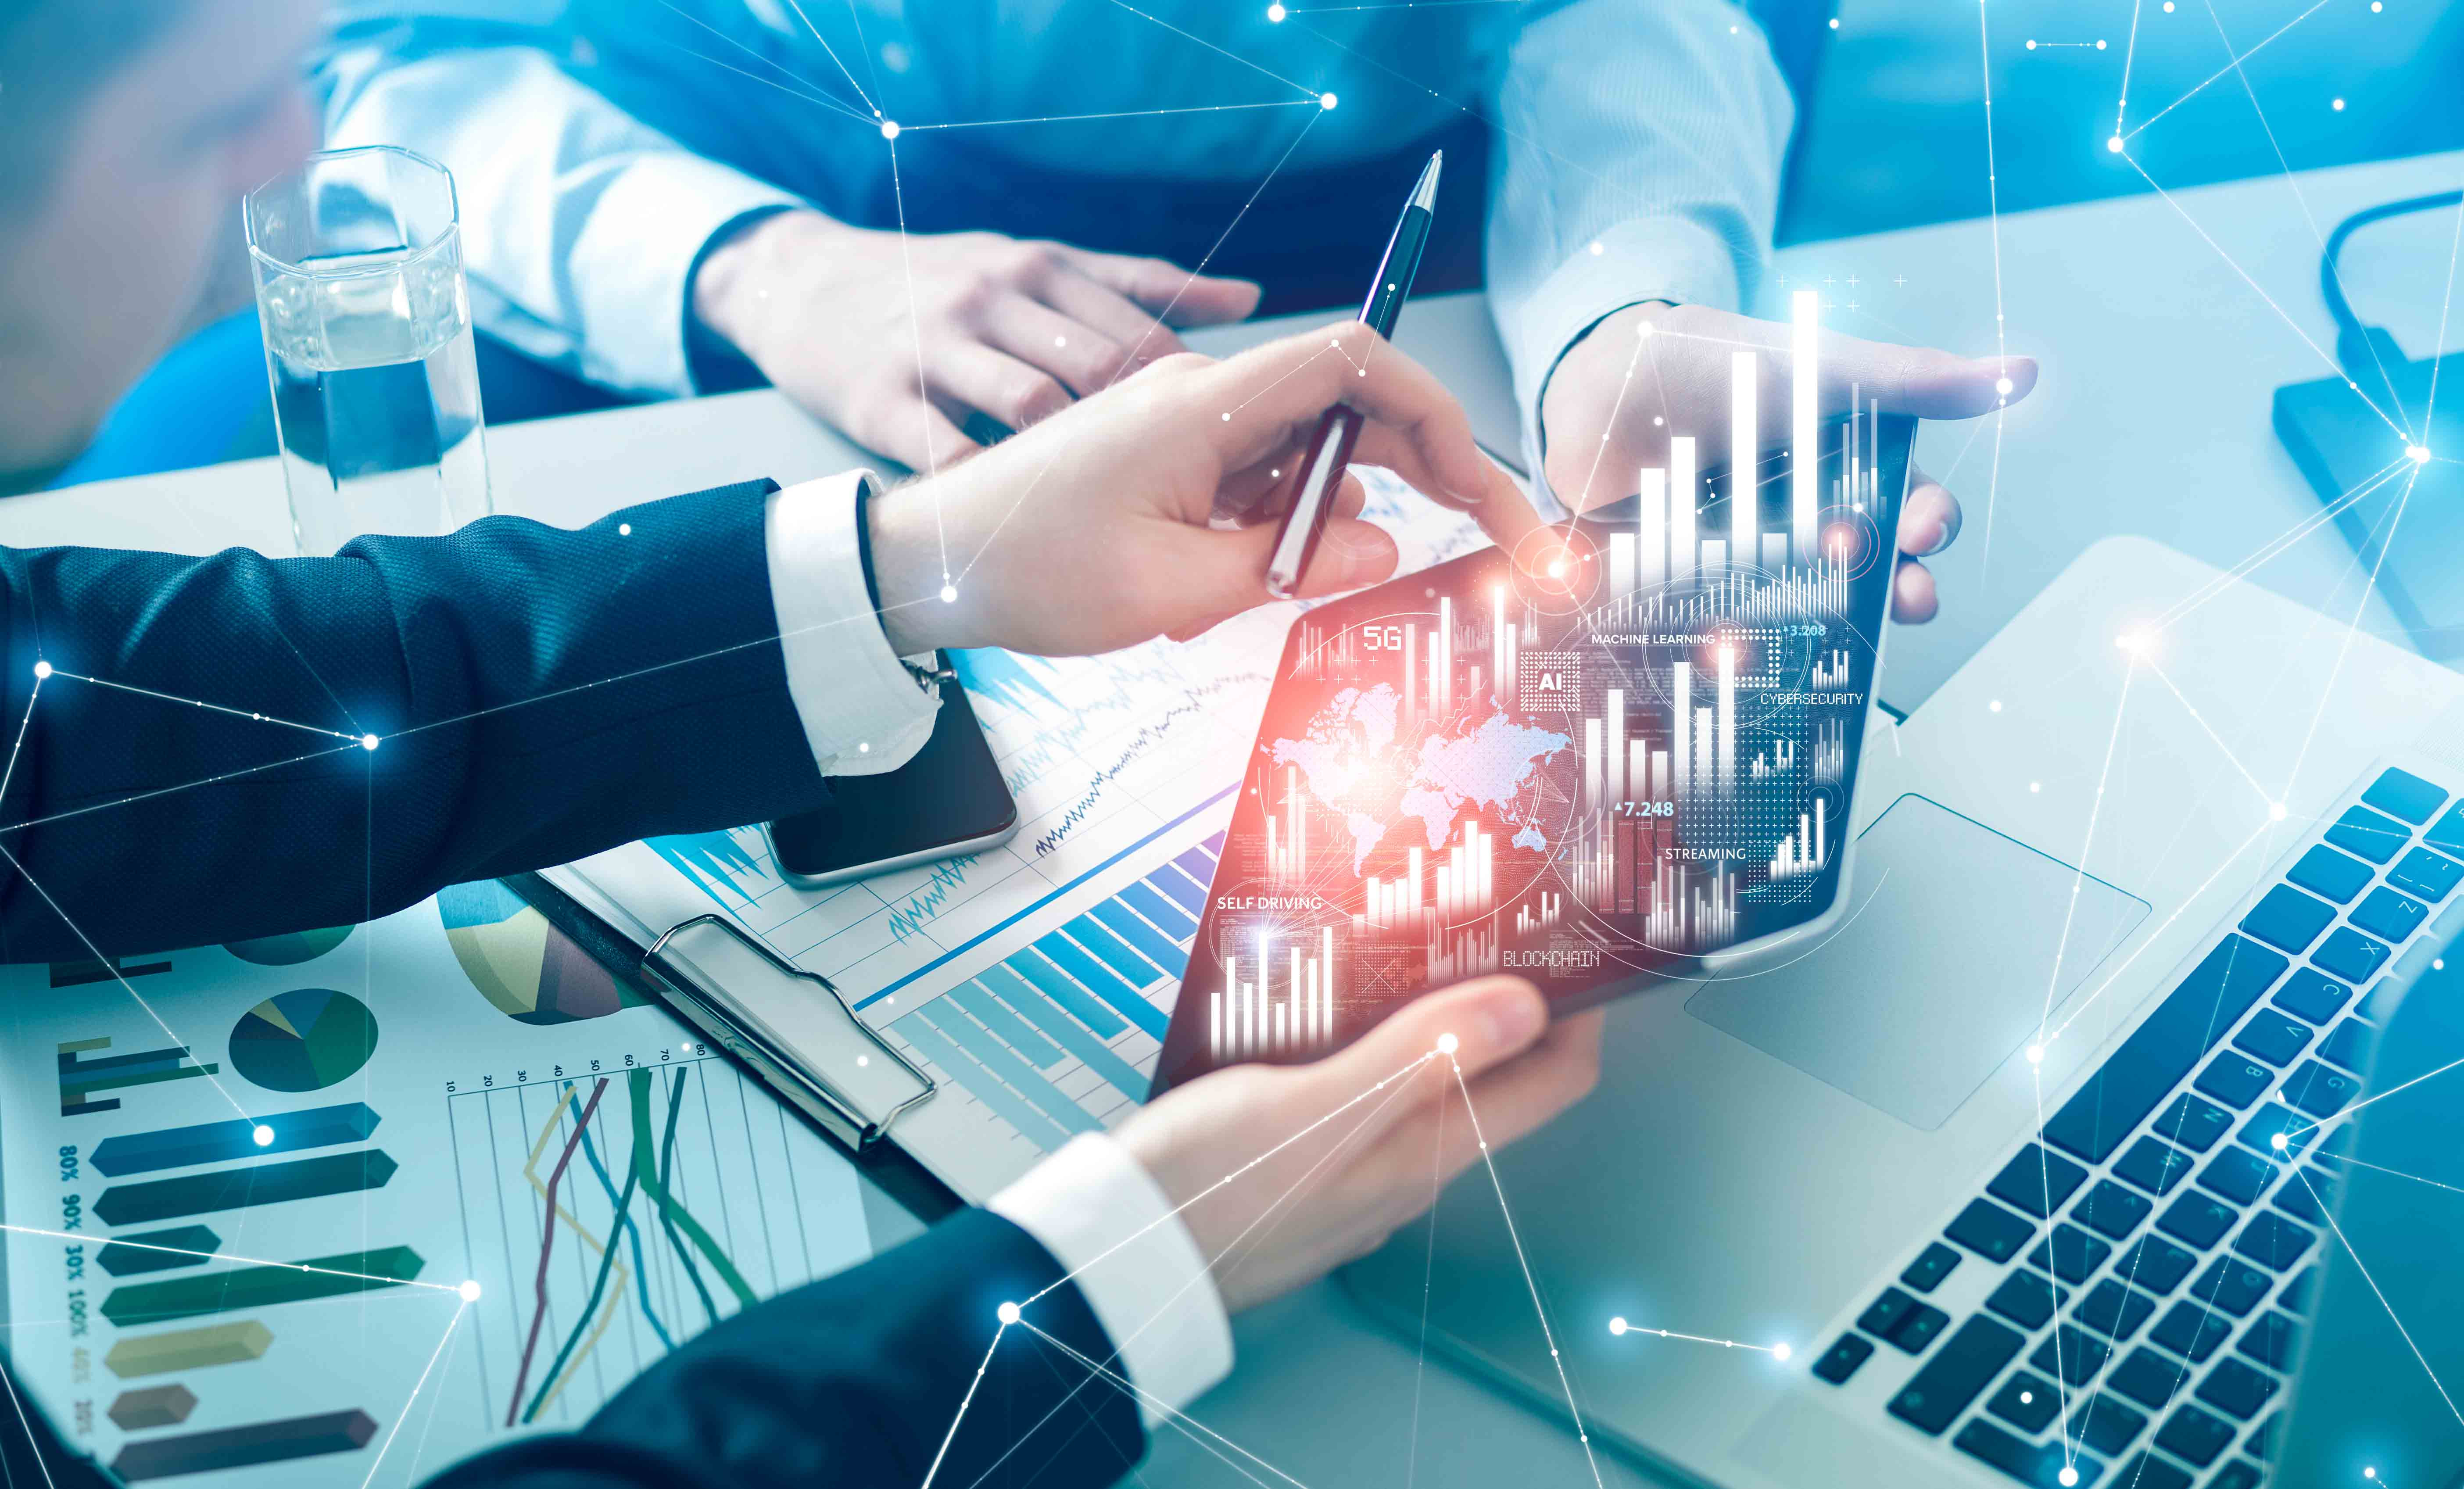 Analítica empresarial: ¿por dónde empezar?